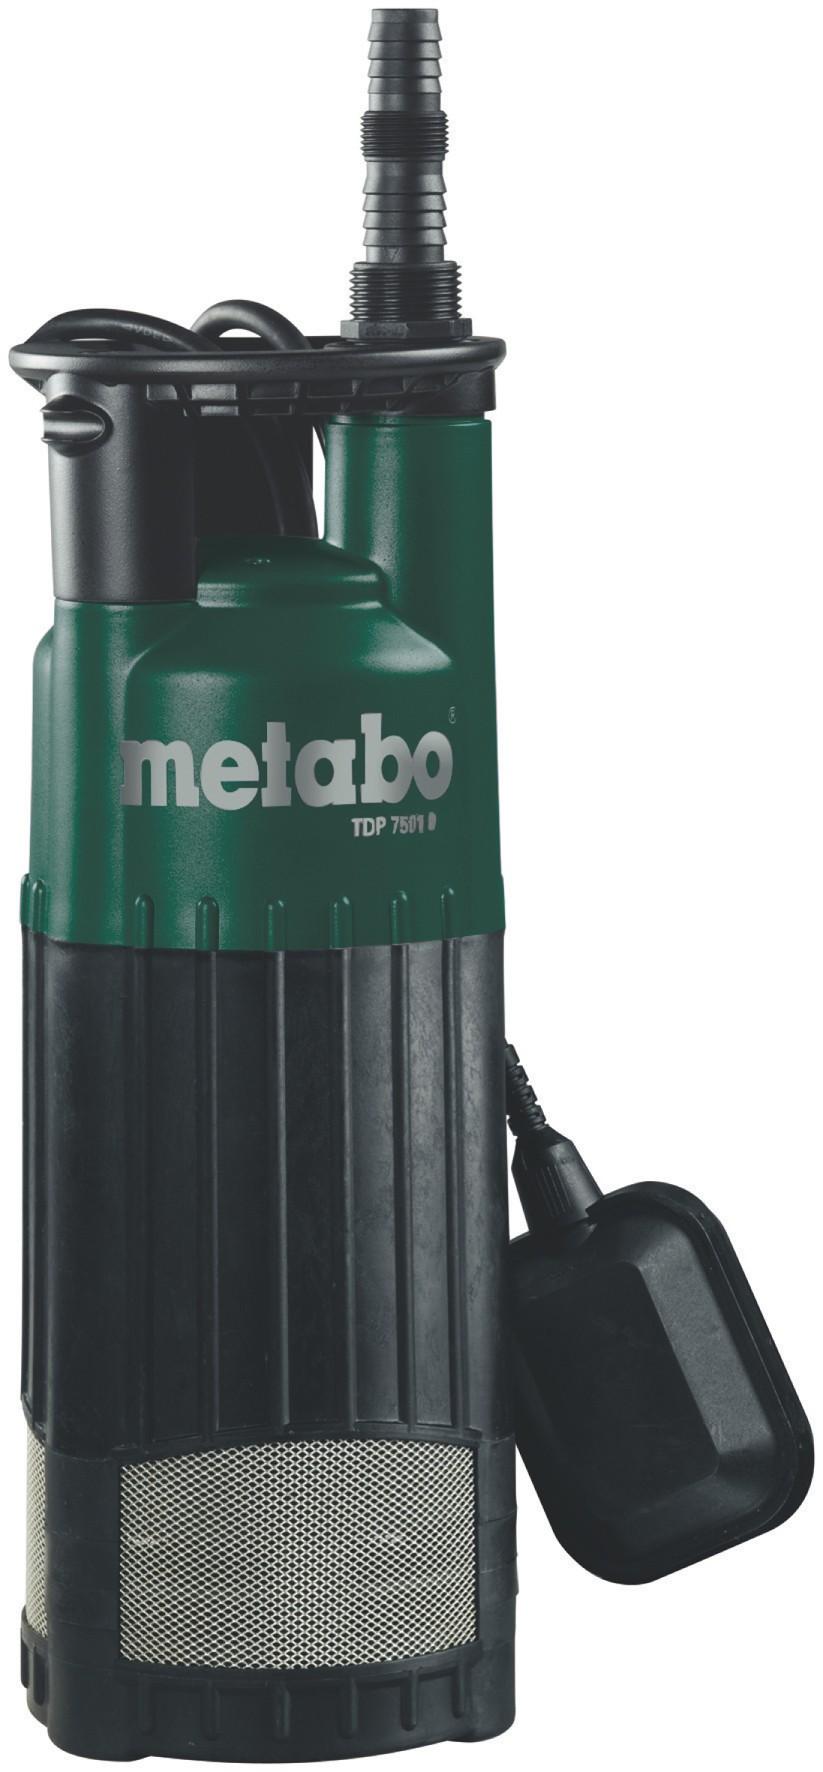 Metabo Tauchdruckpumpe TDP 7501 S 1000 Watt Bild 1